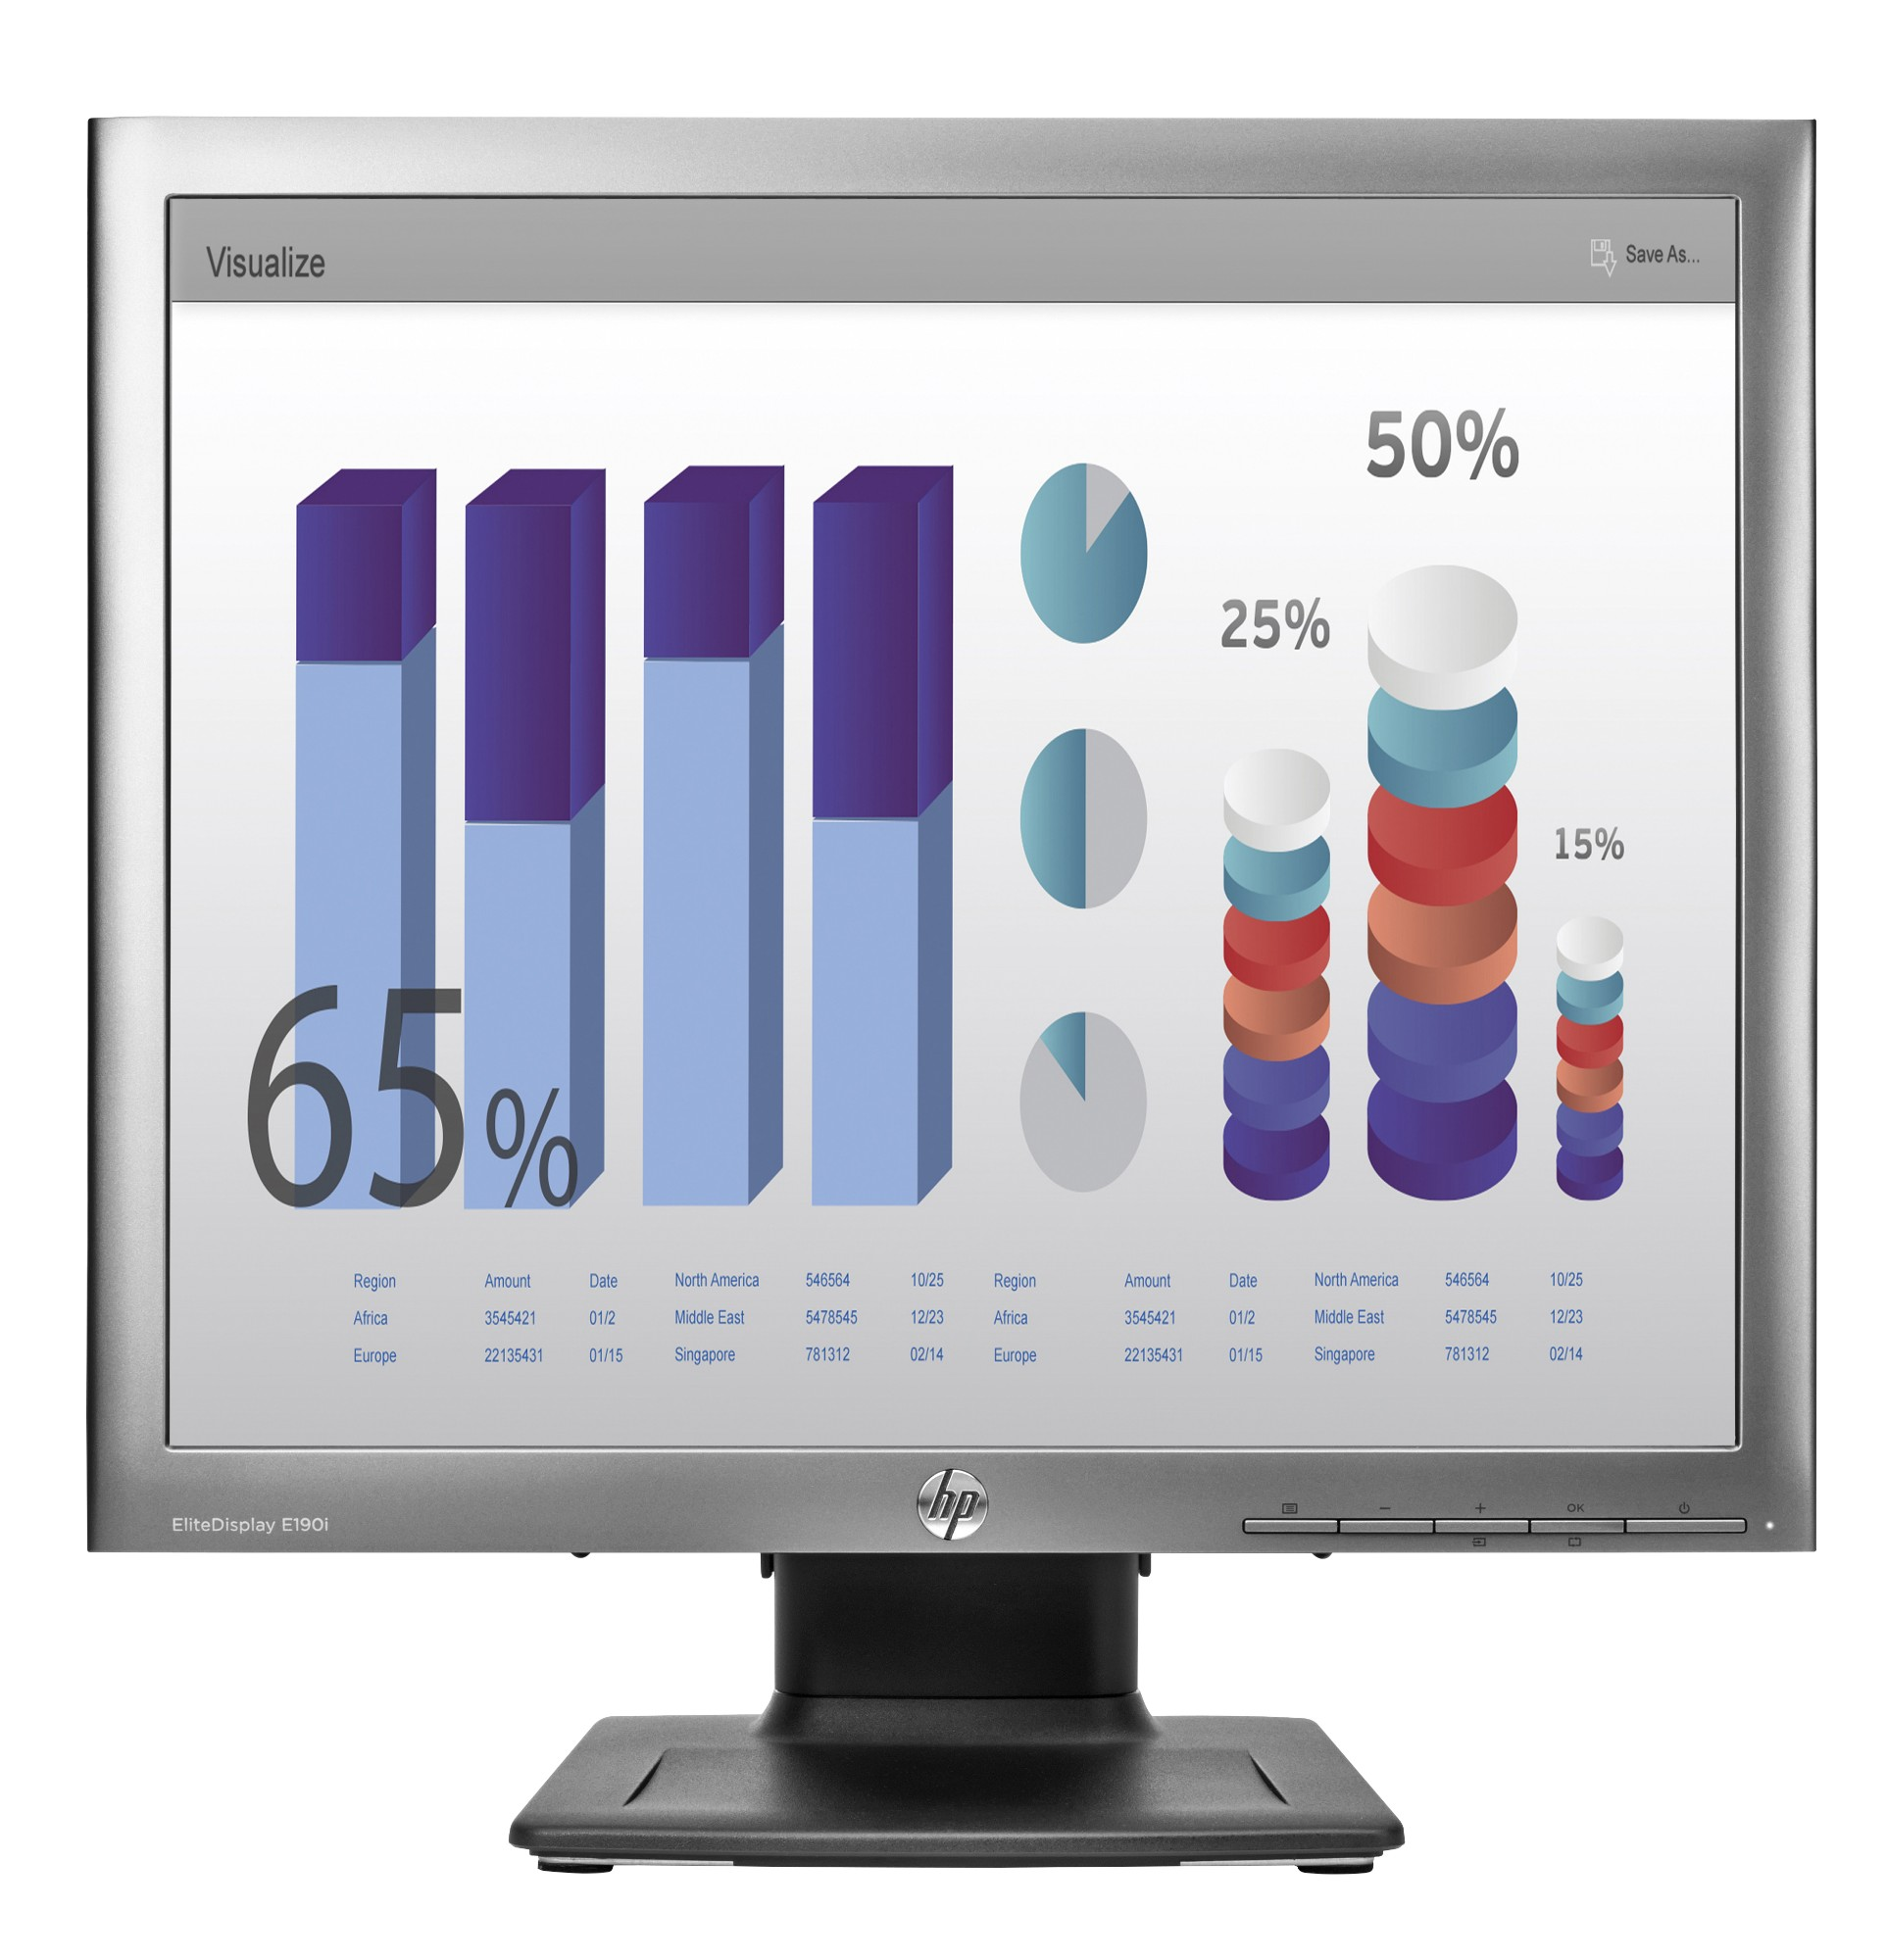 LED Monitor - EliteDisplay E190i - 18.9in - 1280x1024 (SXGA)